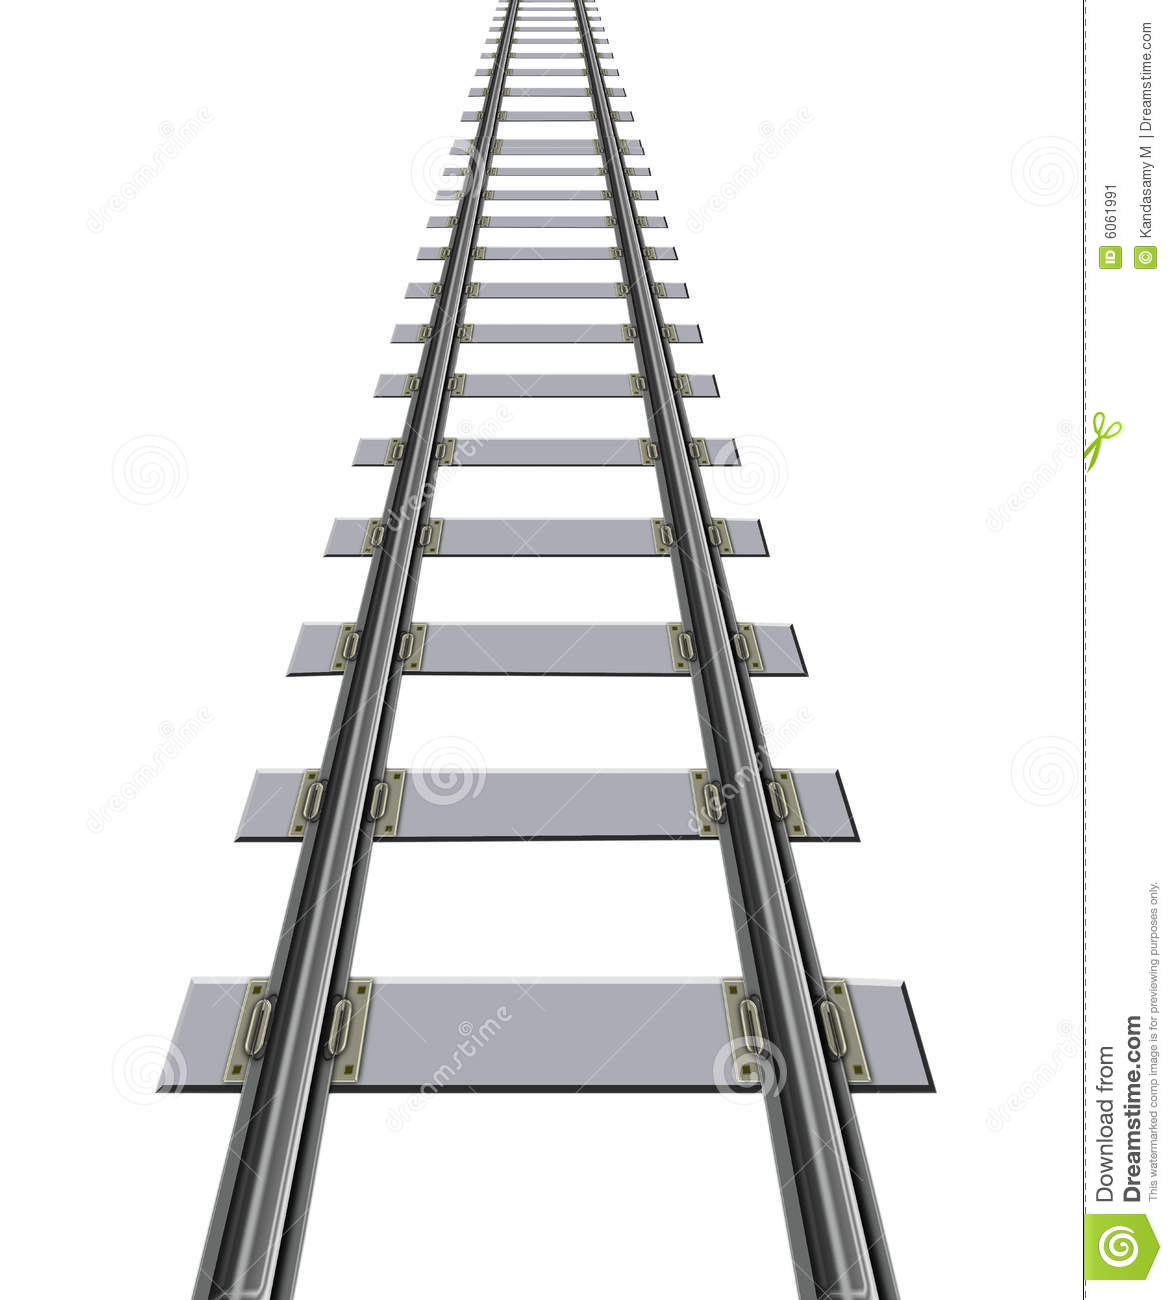 Train Tracks Clipart Clipart Panda